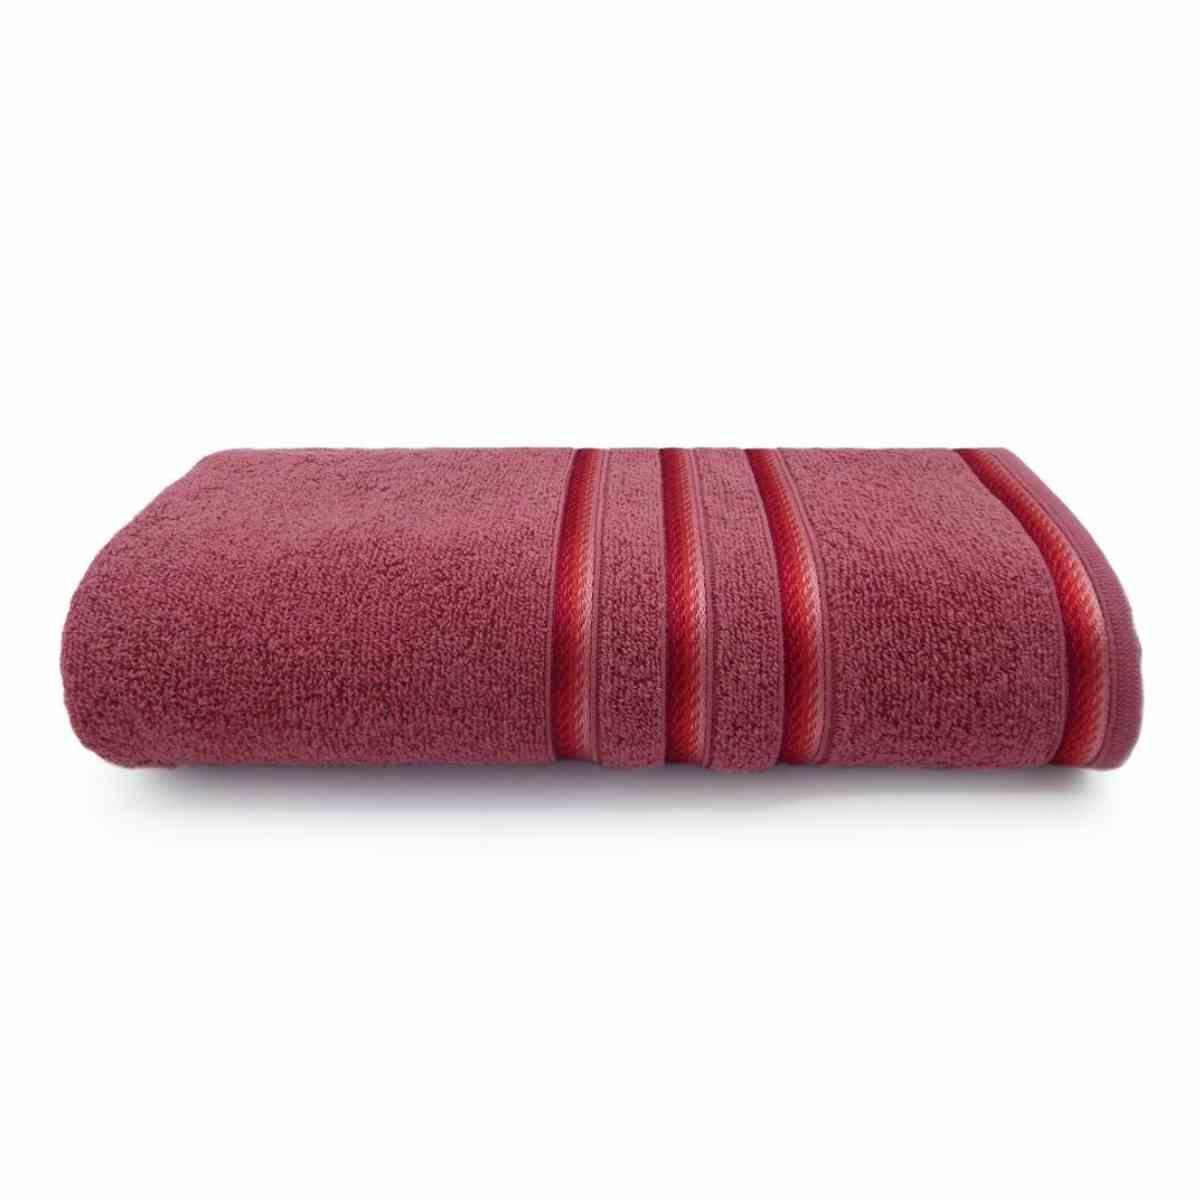 Toalha banho classic 68x135 Rosa Glamour